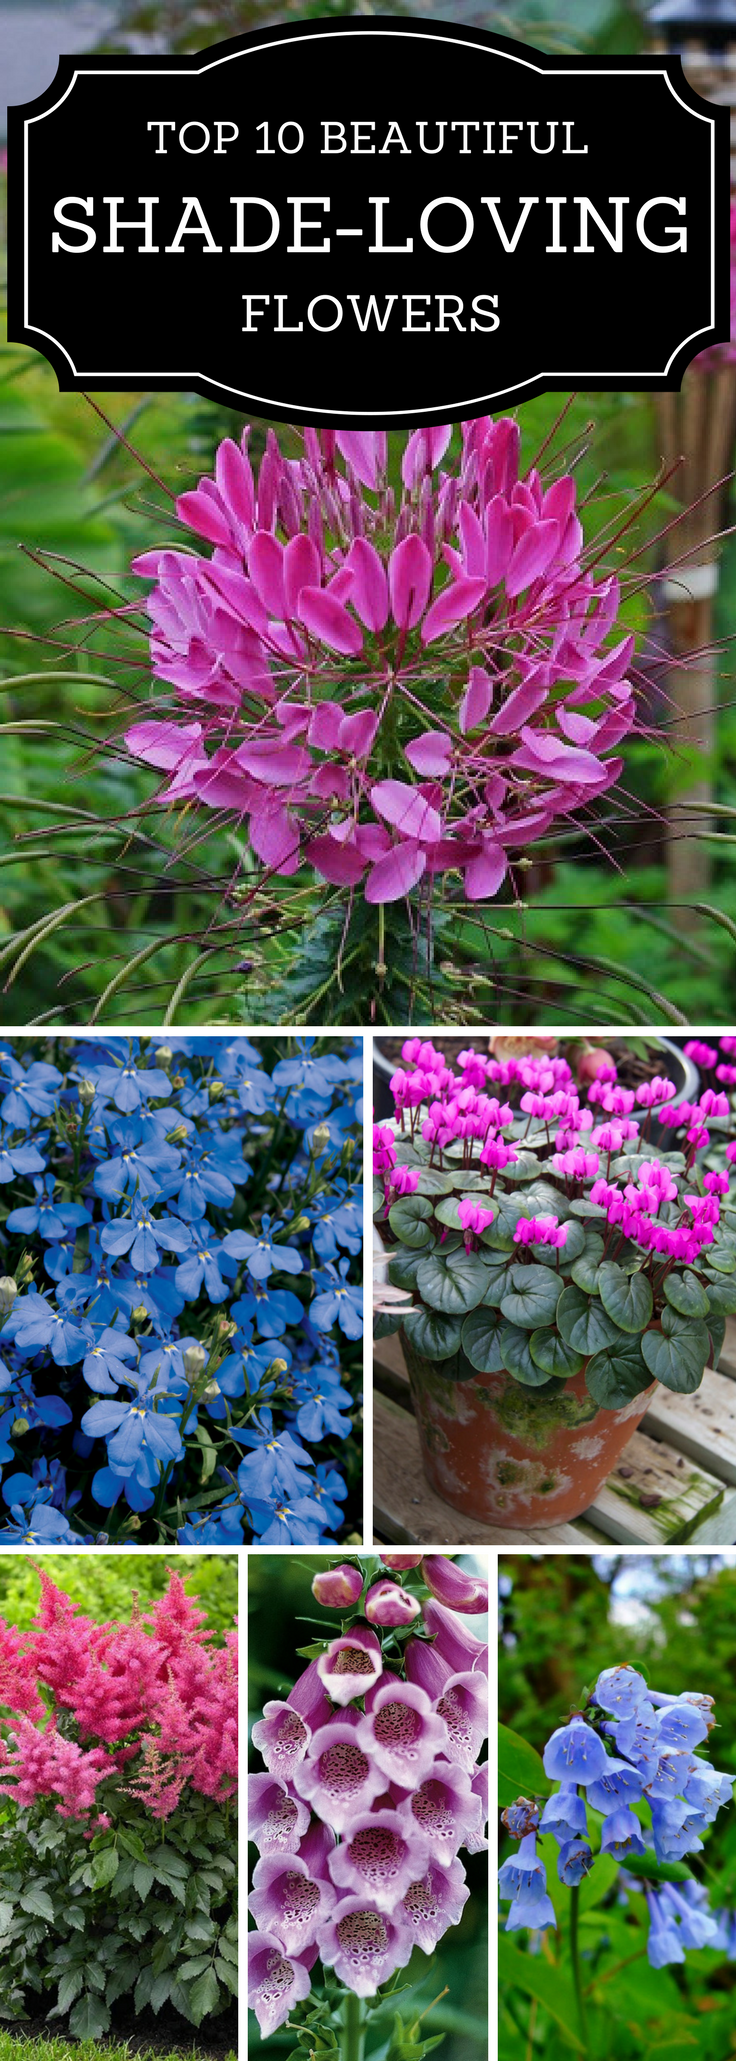 Top 10 Beautiful Shade Loving Flowers Drought Tolerant Plants